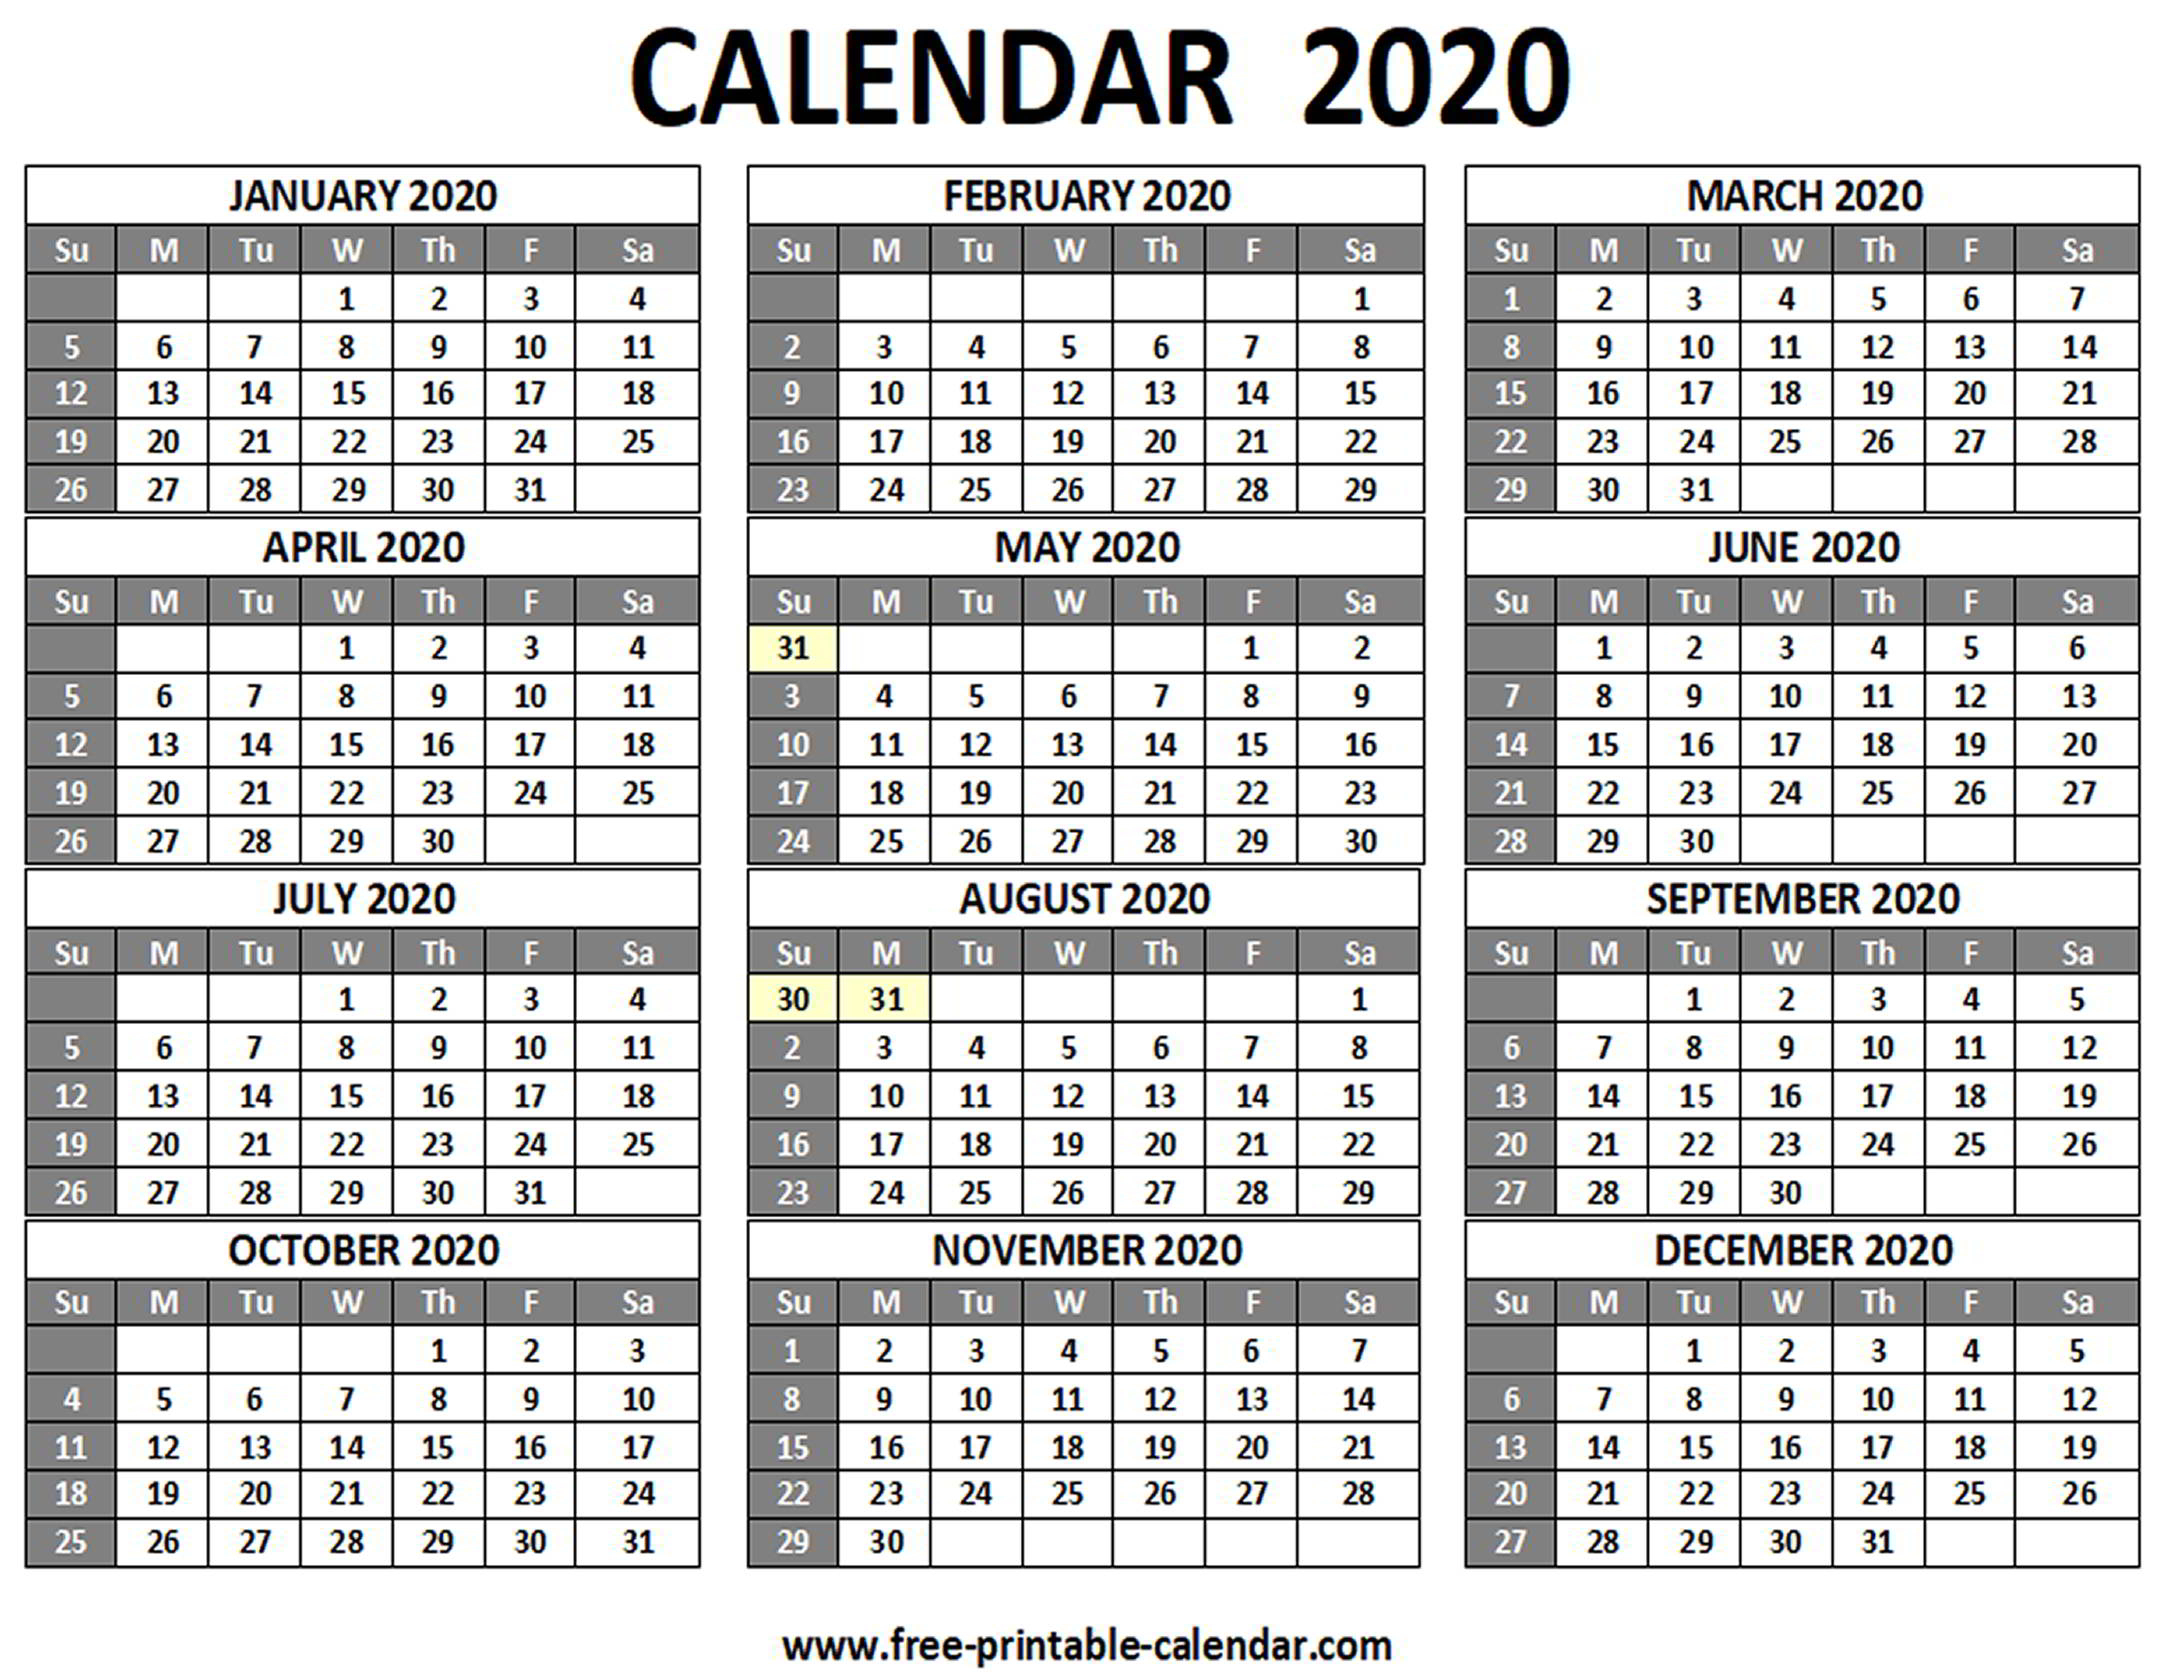 Printable 2020 Calendar - Free-Printable-Calendar for 2020 Calendar Printable One Page